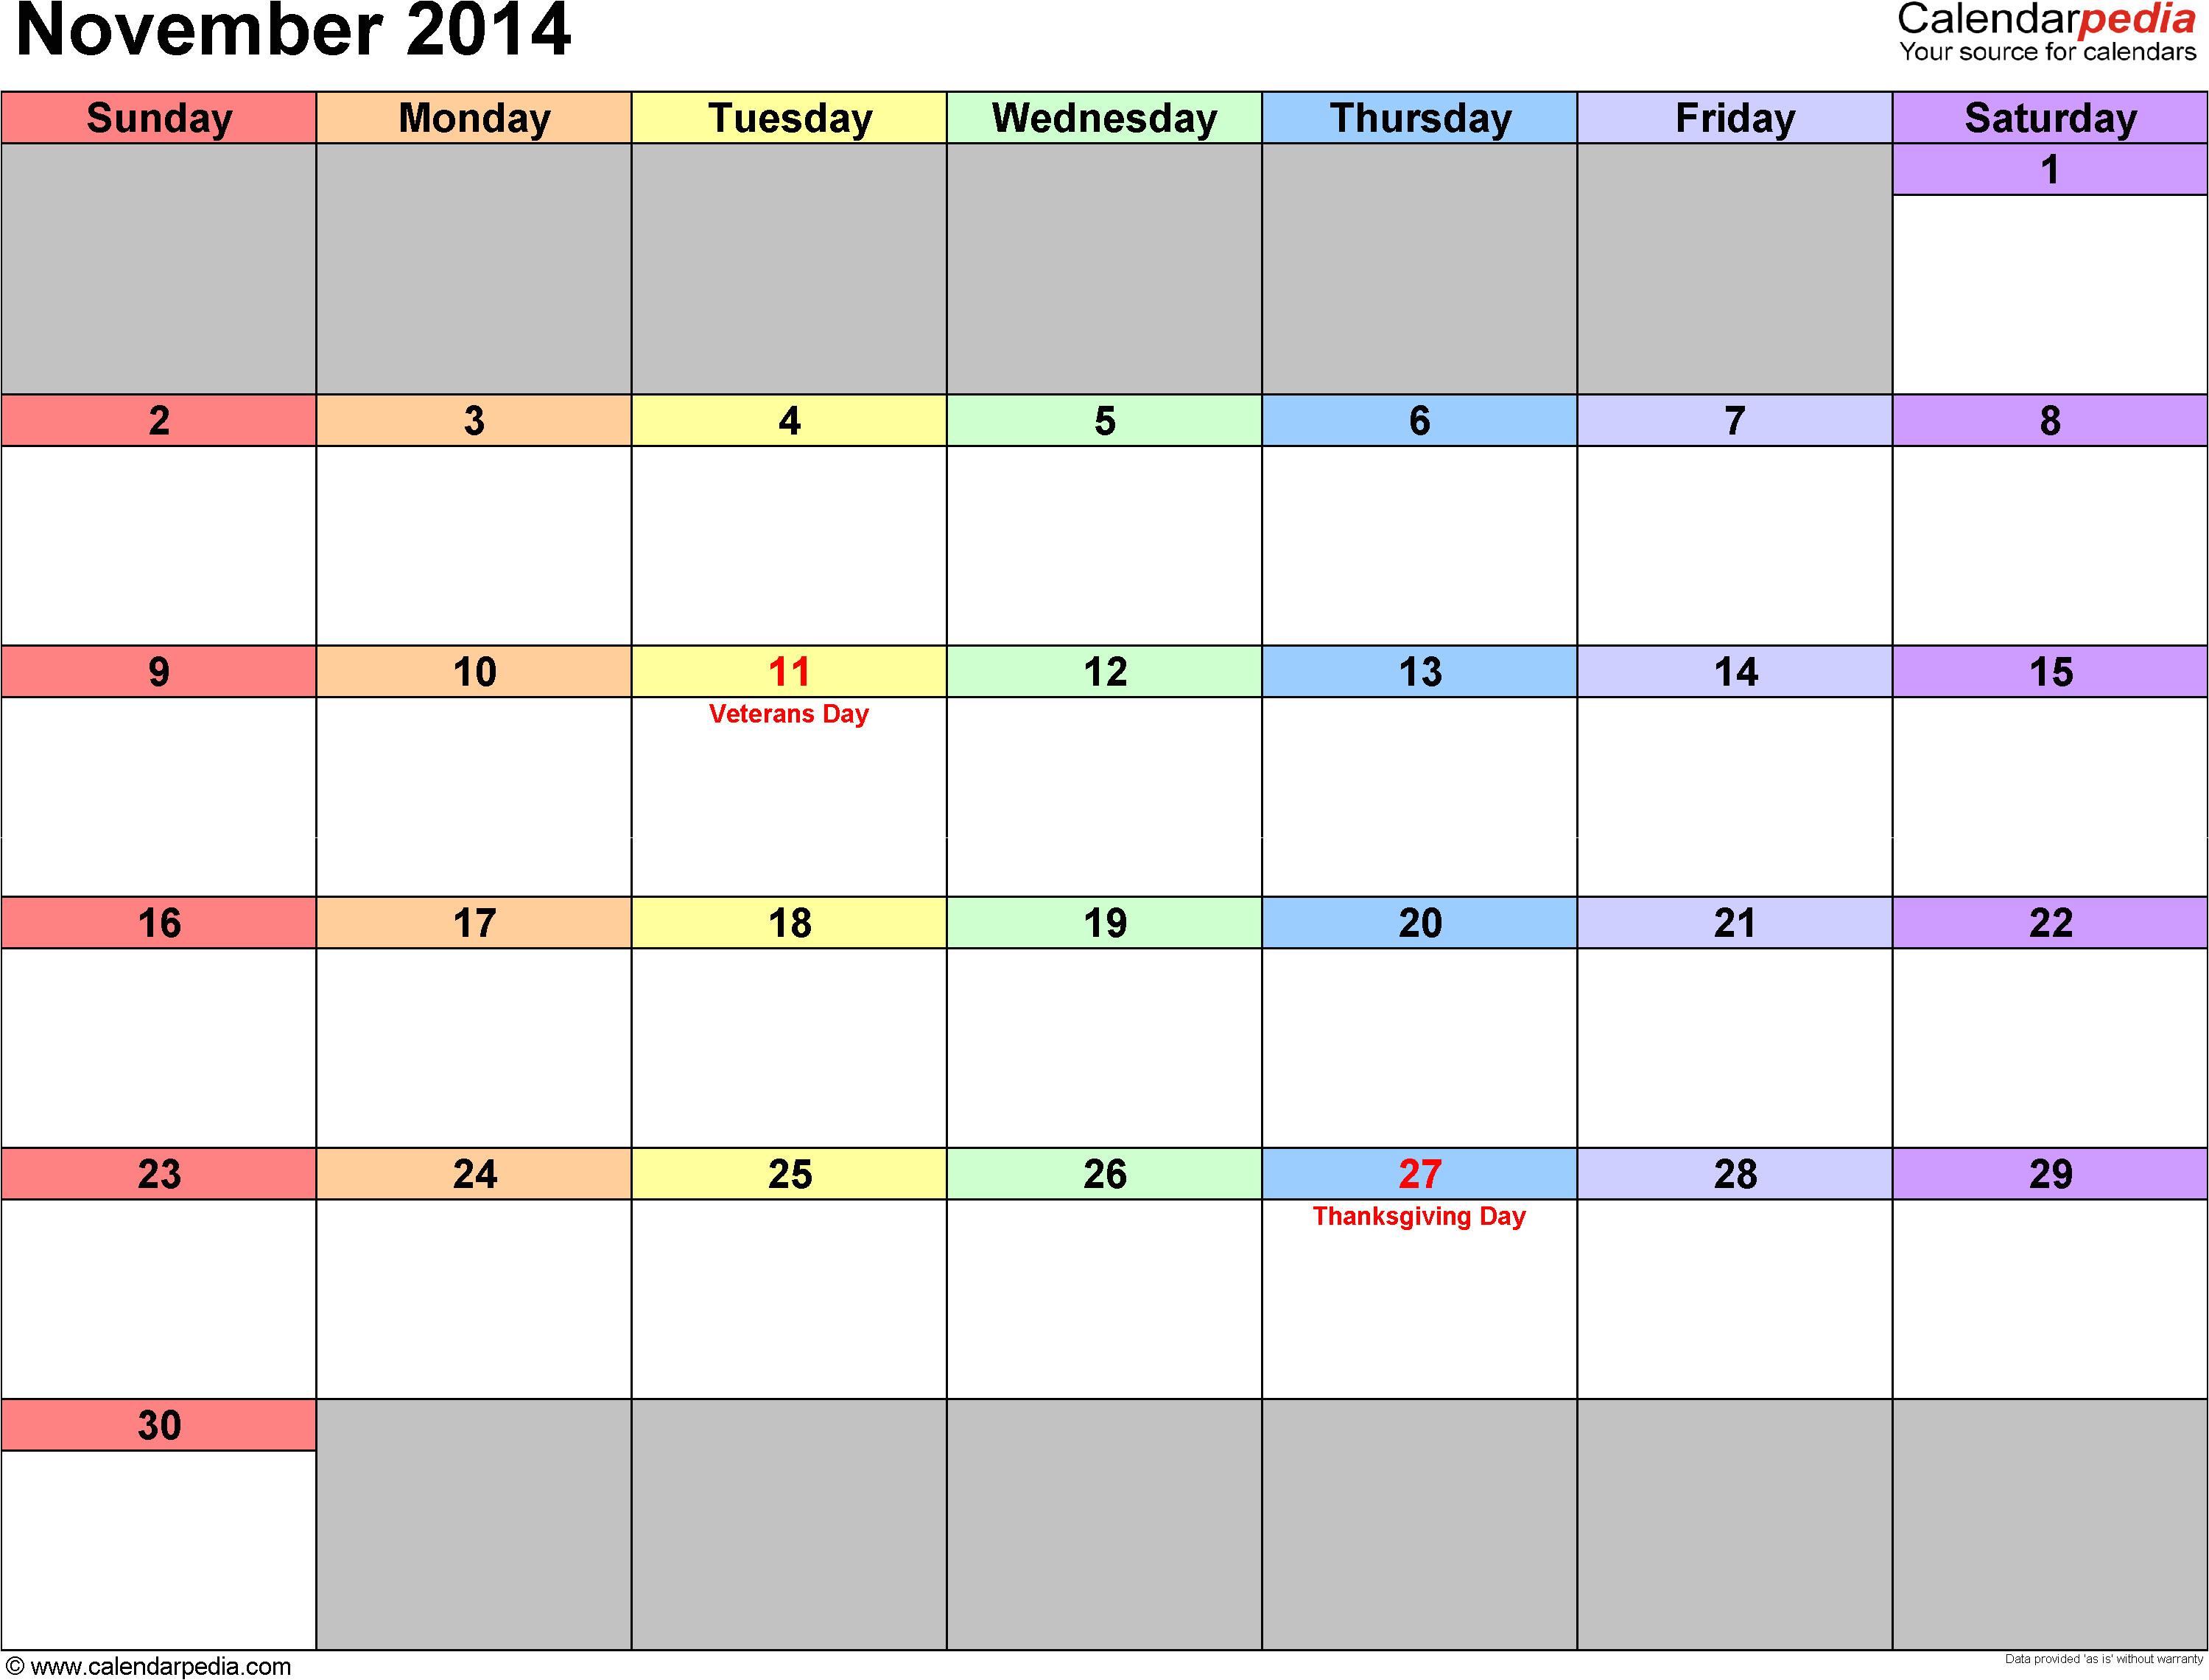 Blank Calendar Template November 2014 November 2014 Calendars for Word Excel Pdf